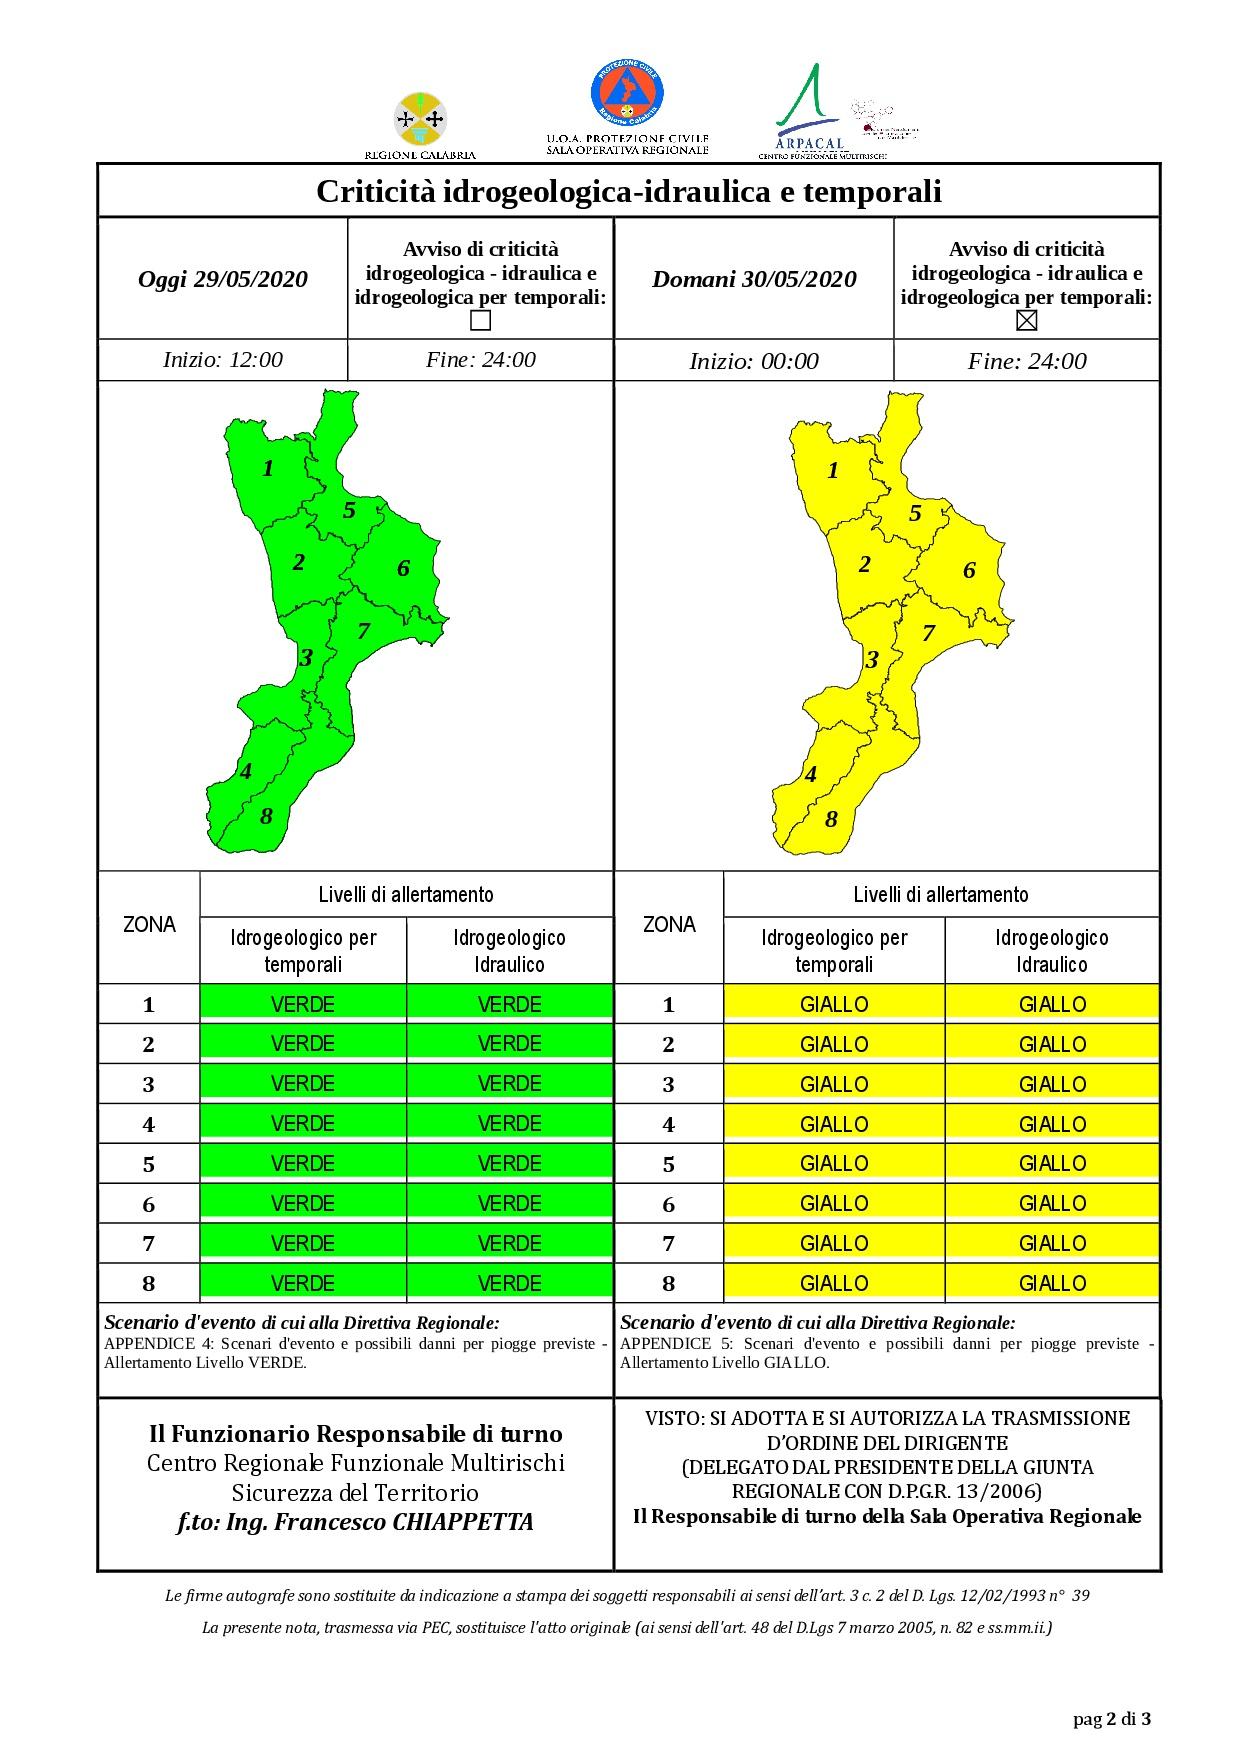 Criticità idrogeologica-idraulica e temporali in Calabria 29-05-2020